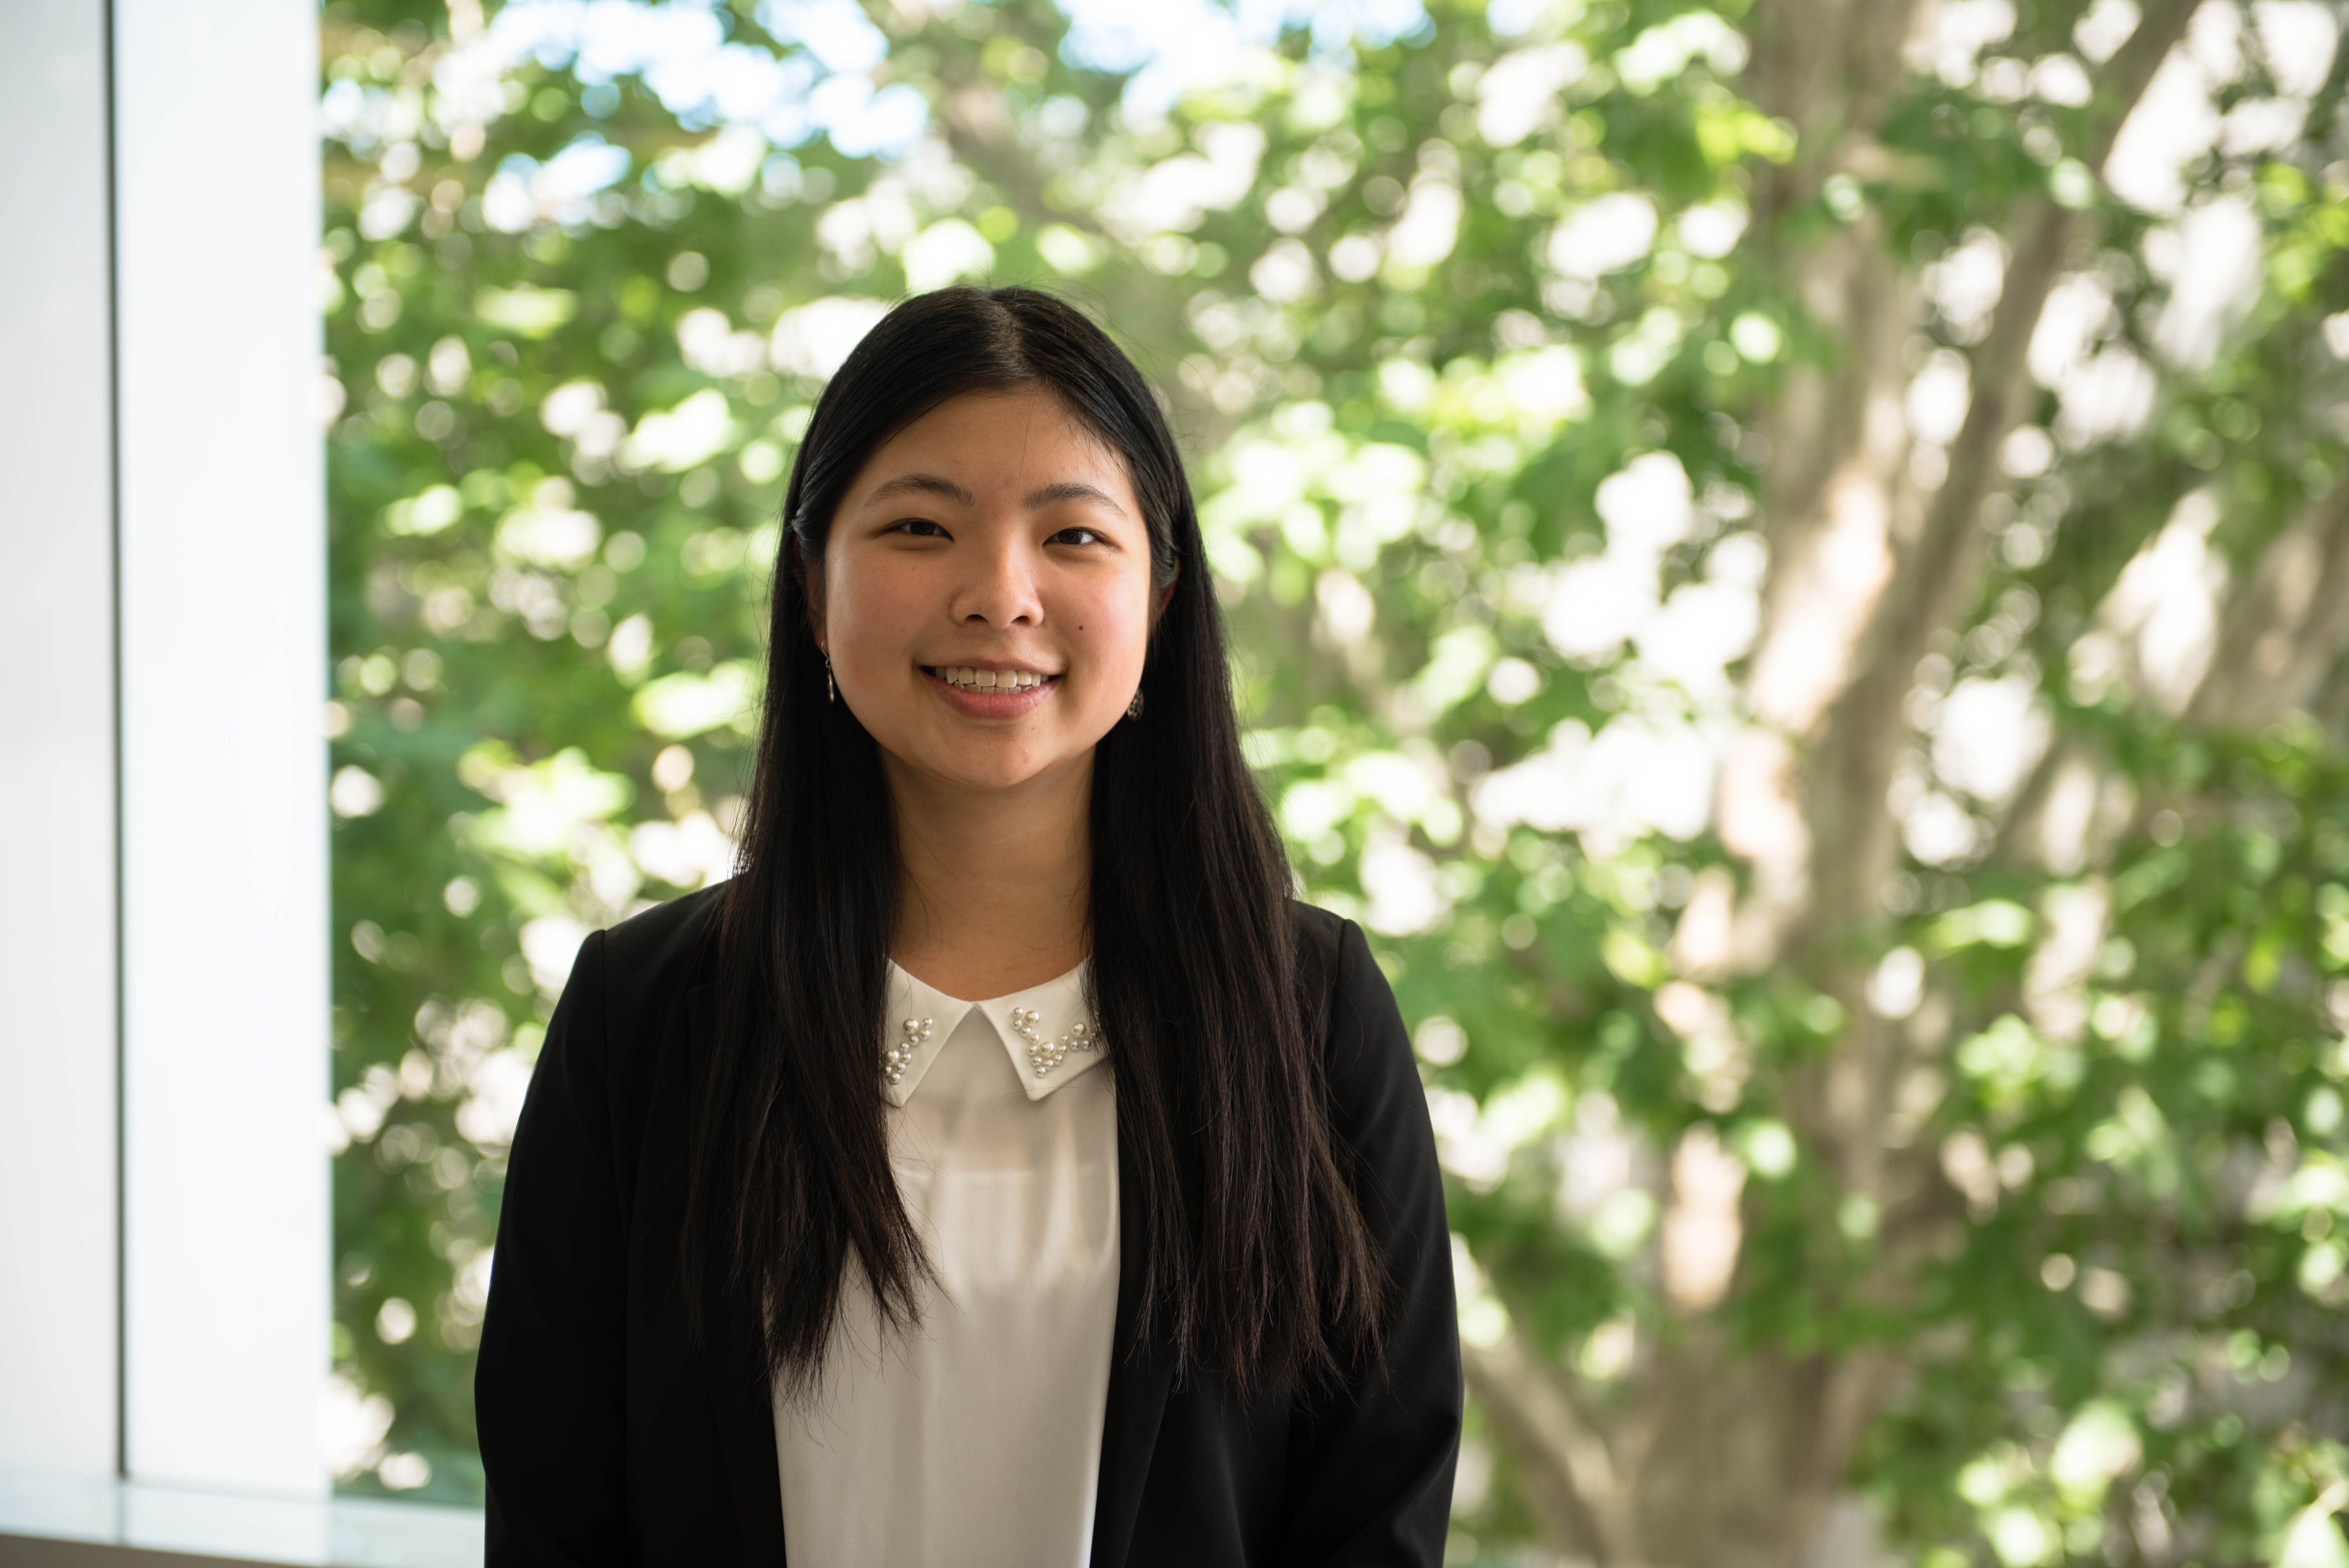 Janette Wong